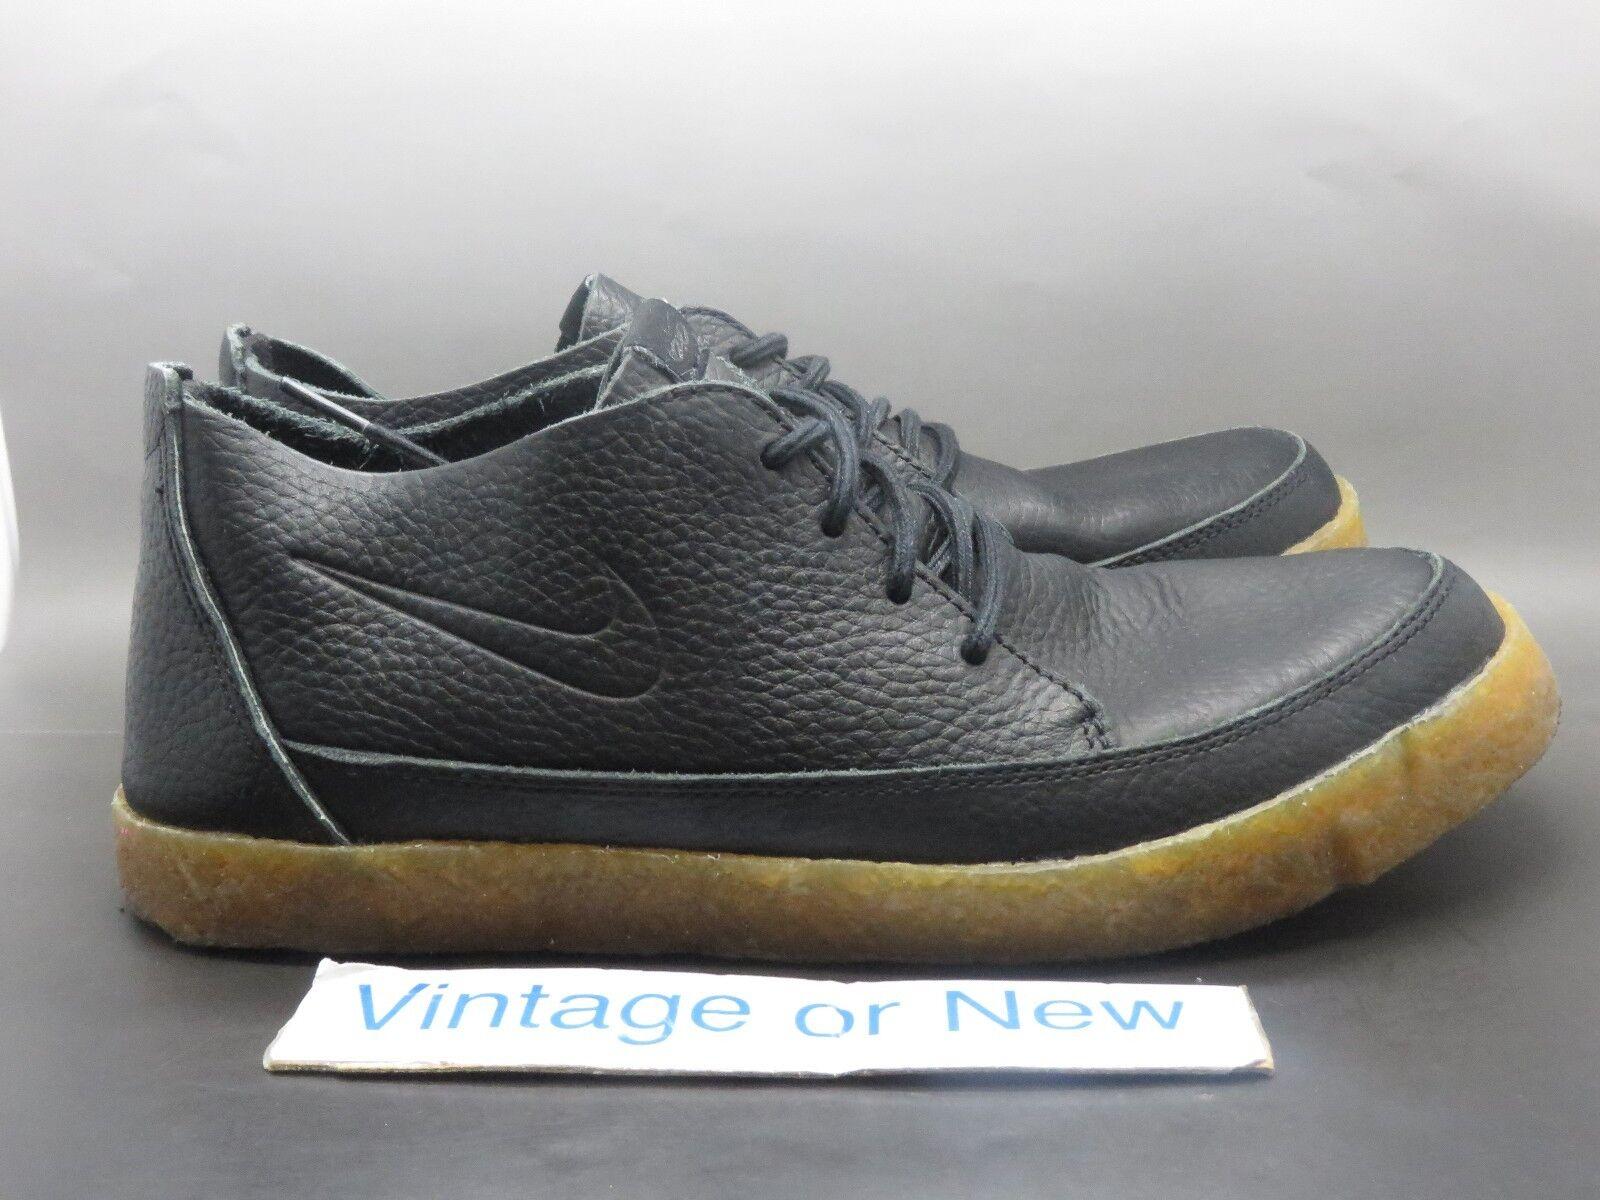 Men's Nike Rzol Low Premium 6.0 Black Gum Shoes Price reduction